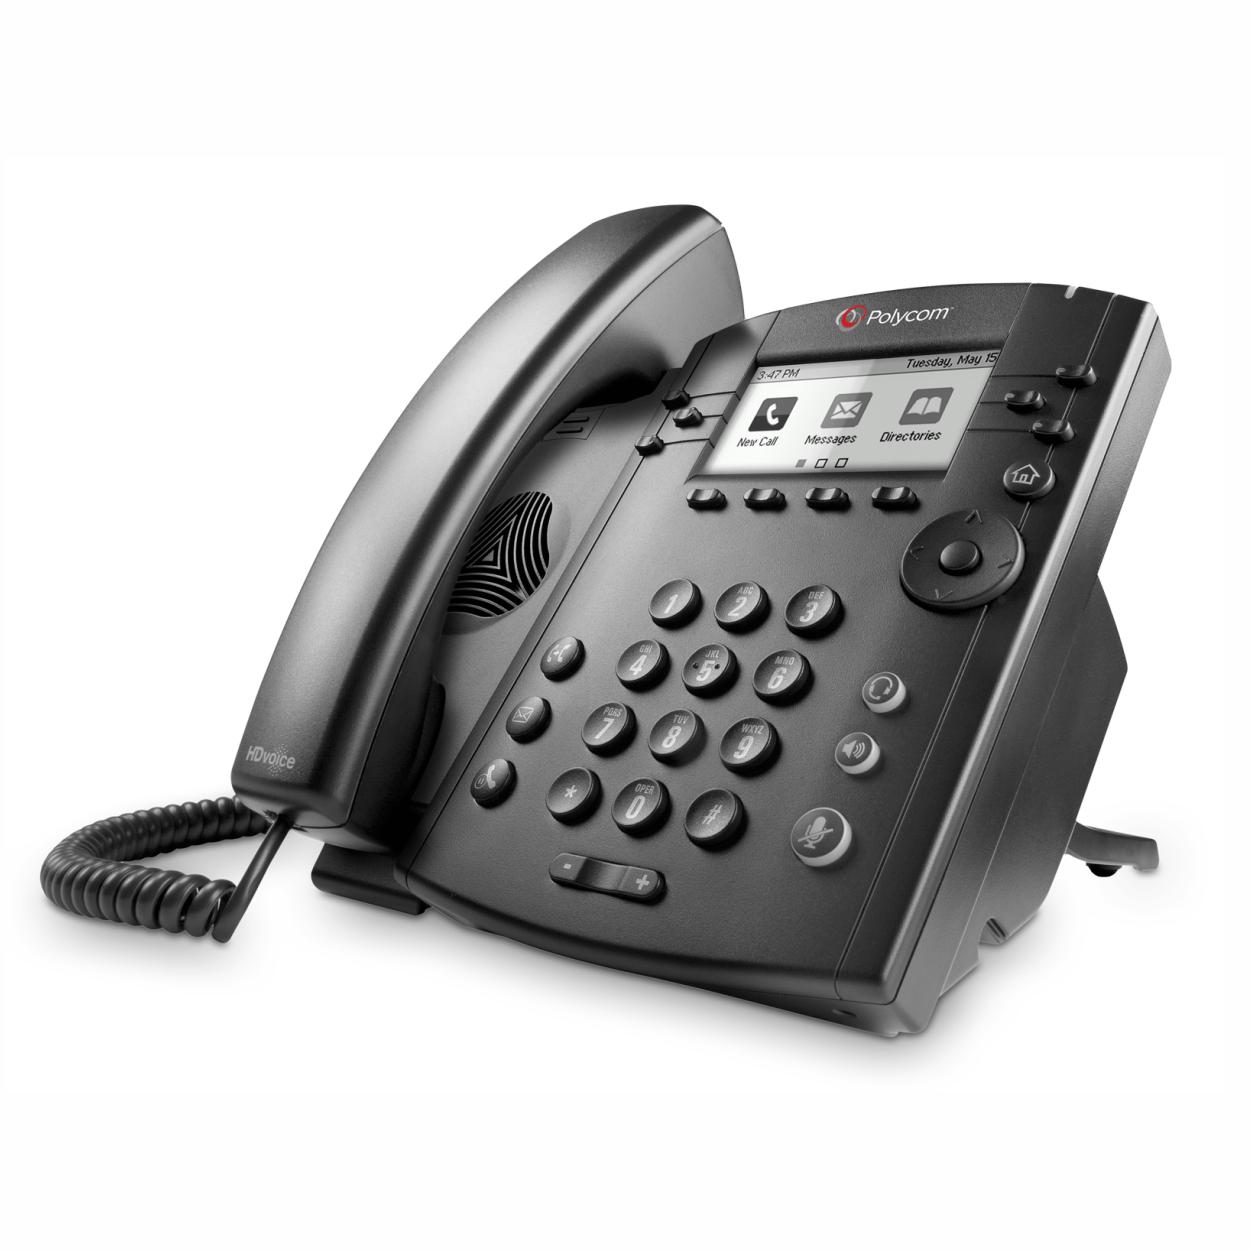 PBX-Contact-Toshiba